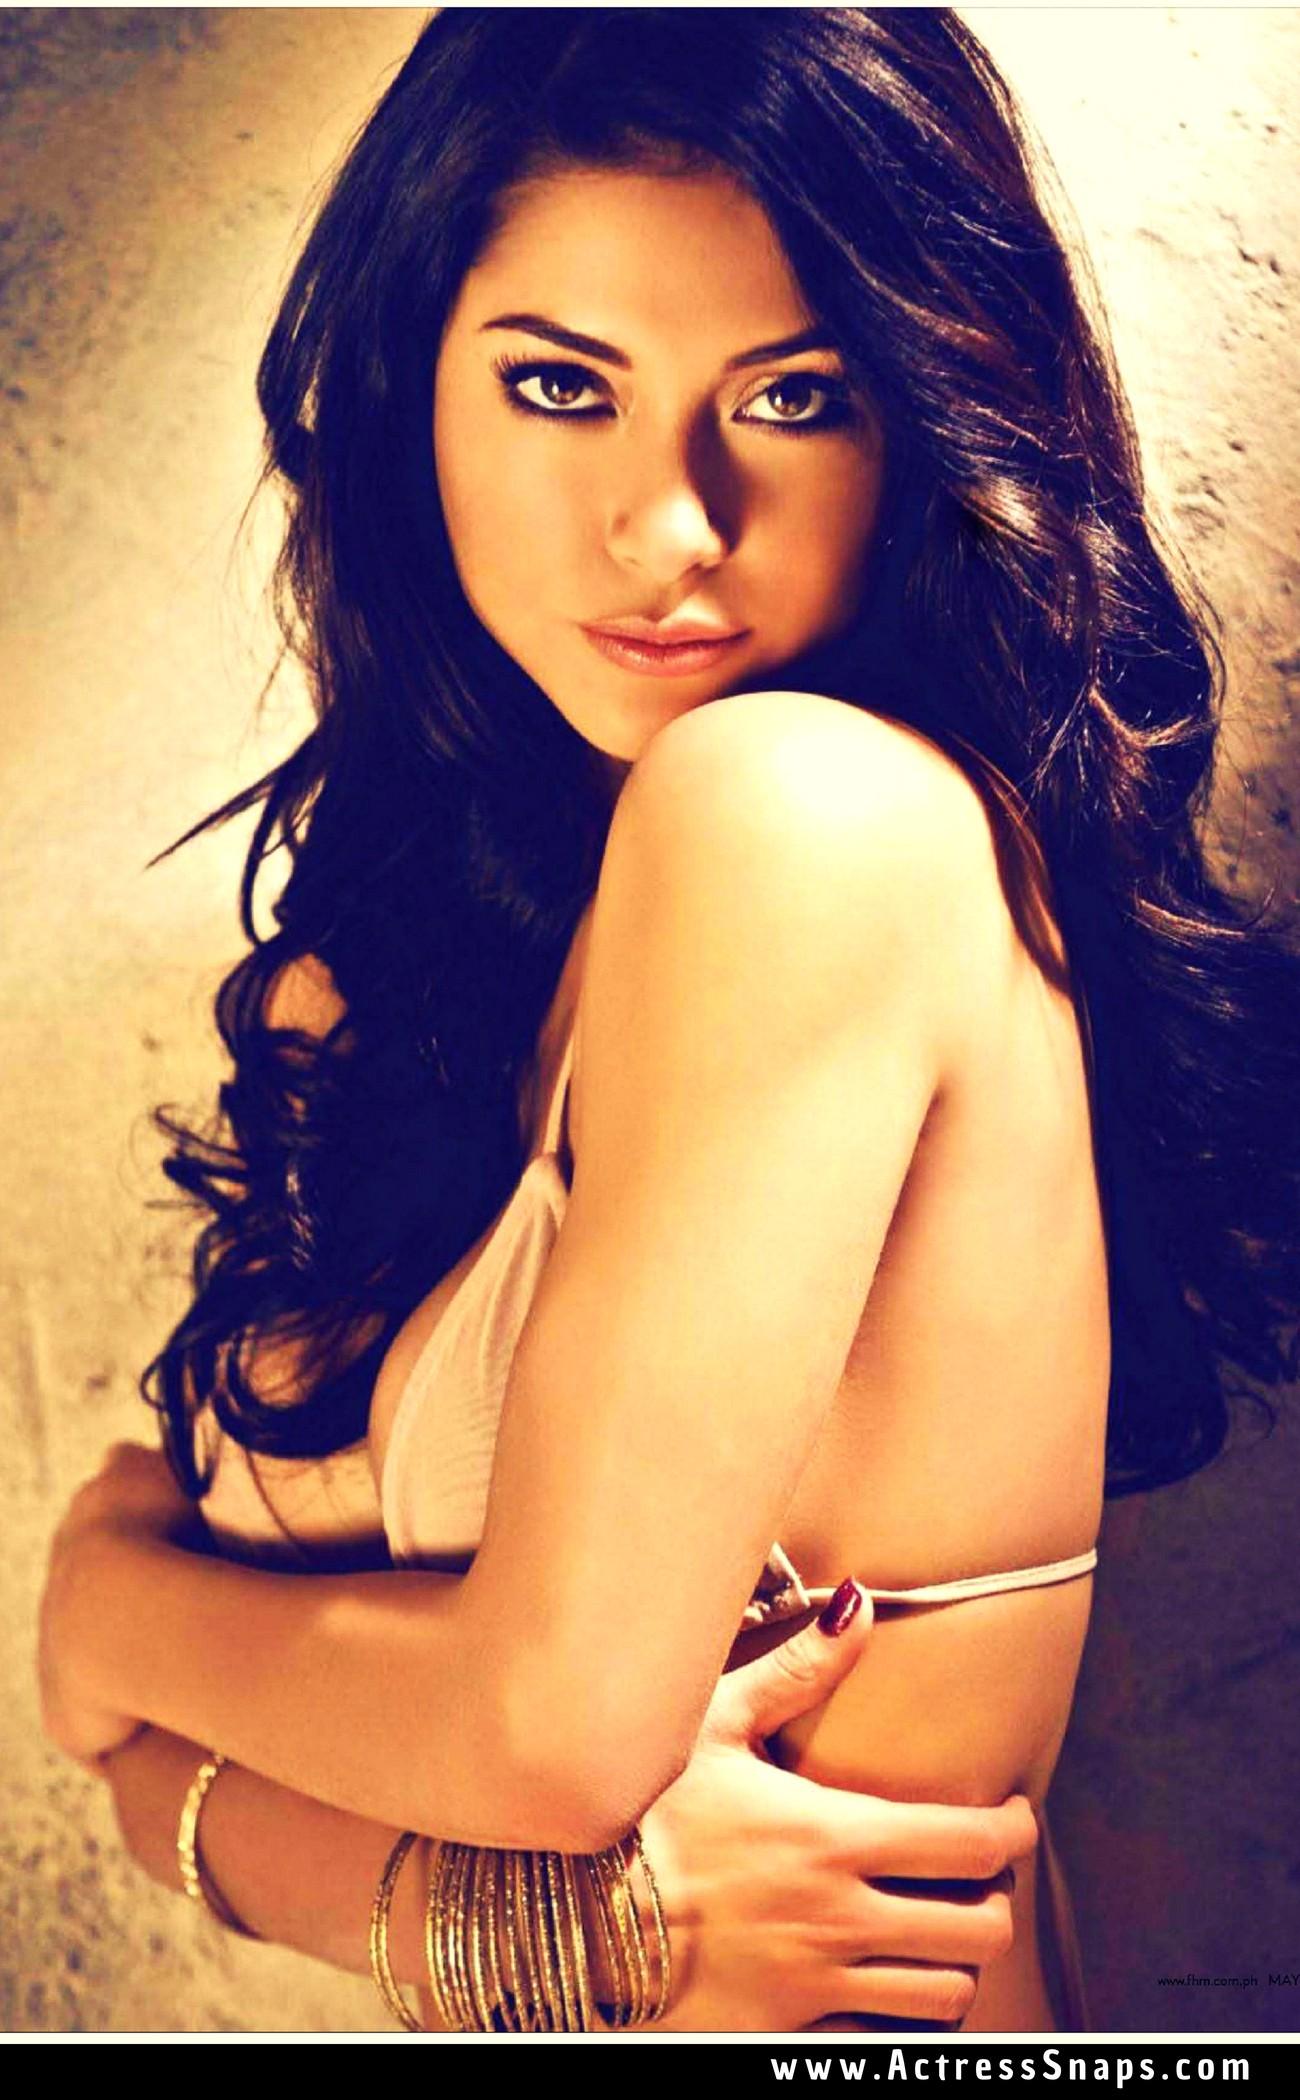 Arianny Celeste - Sexy Photo Shoot Collection - Sexy Actress Pictures | Hot Actress Pictures - ActressSnaps.com